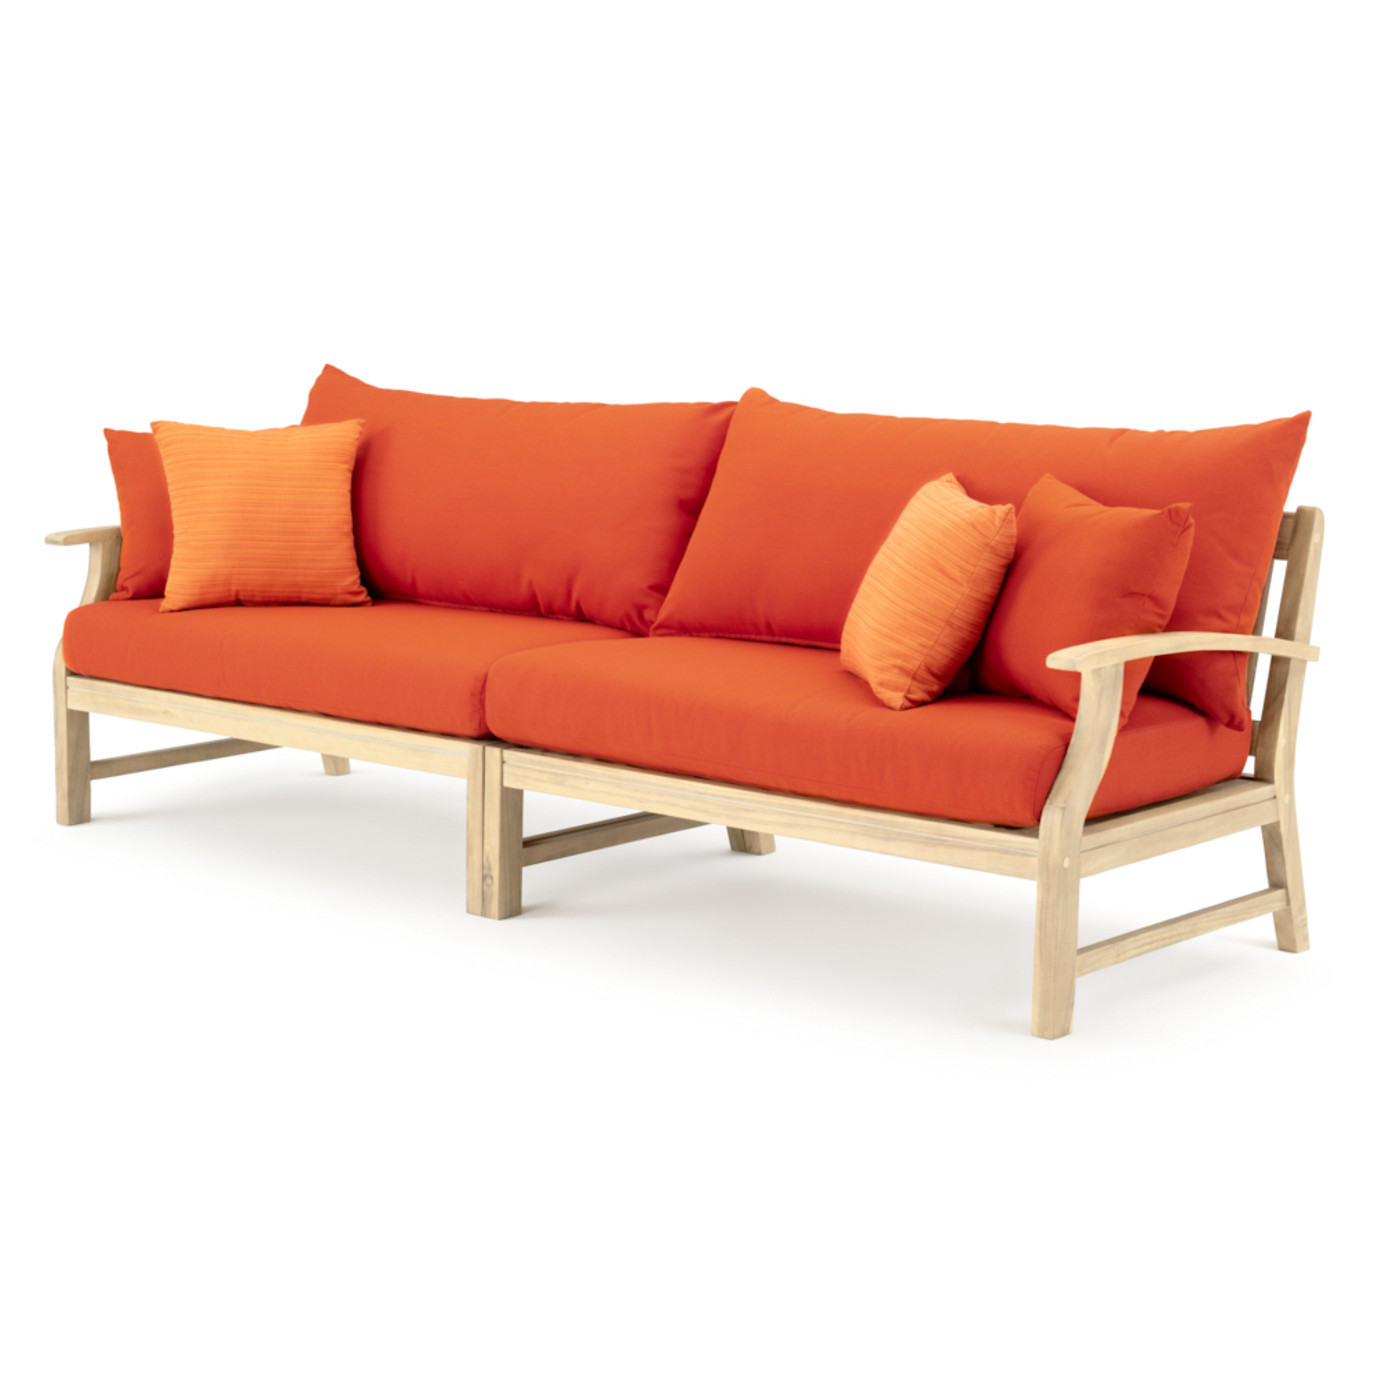 Kooper 11 Piece Estate Collection - Tikka Orange